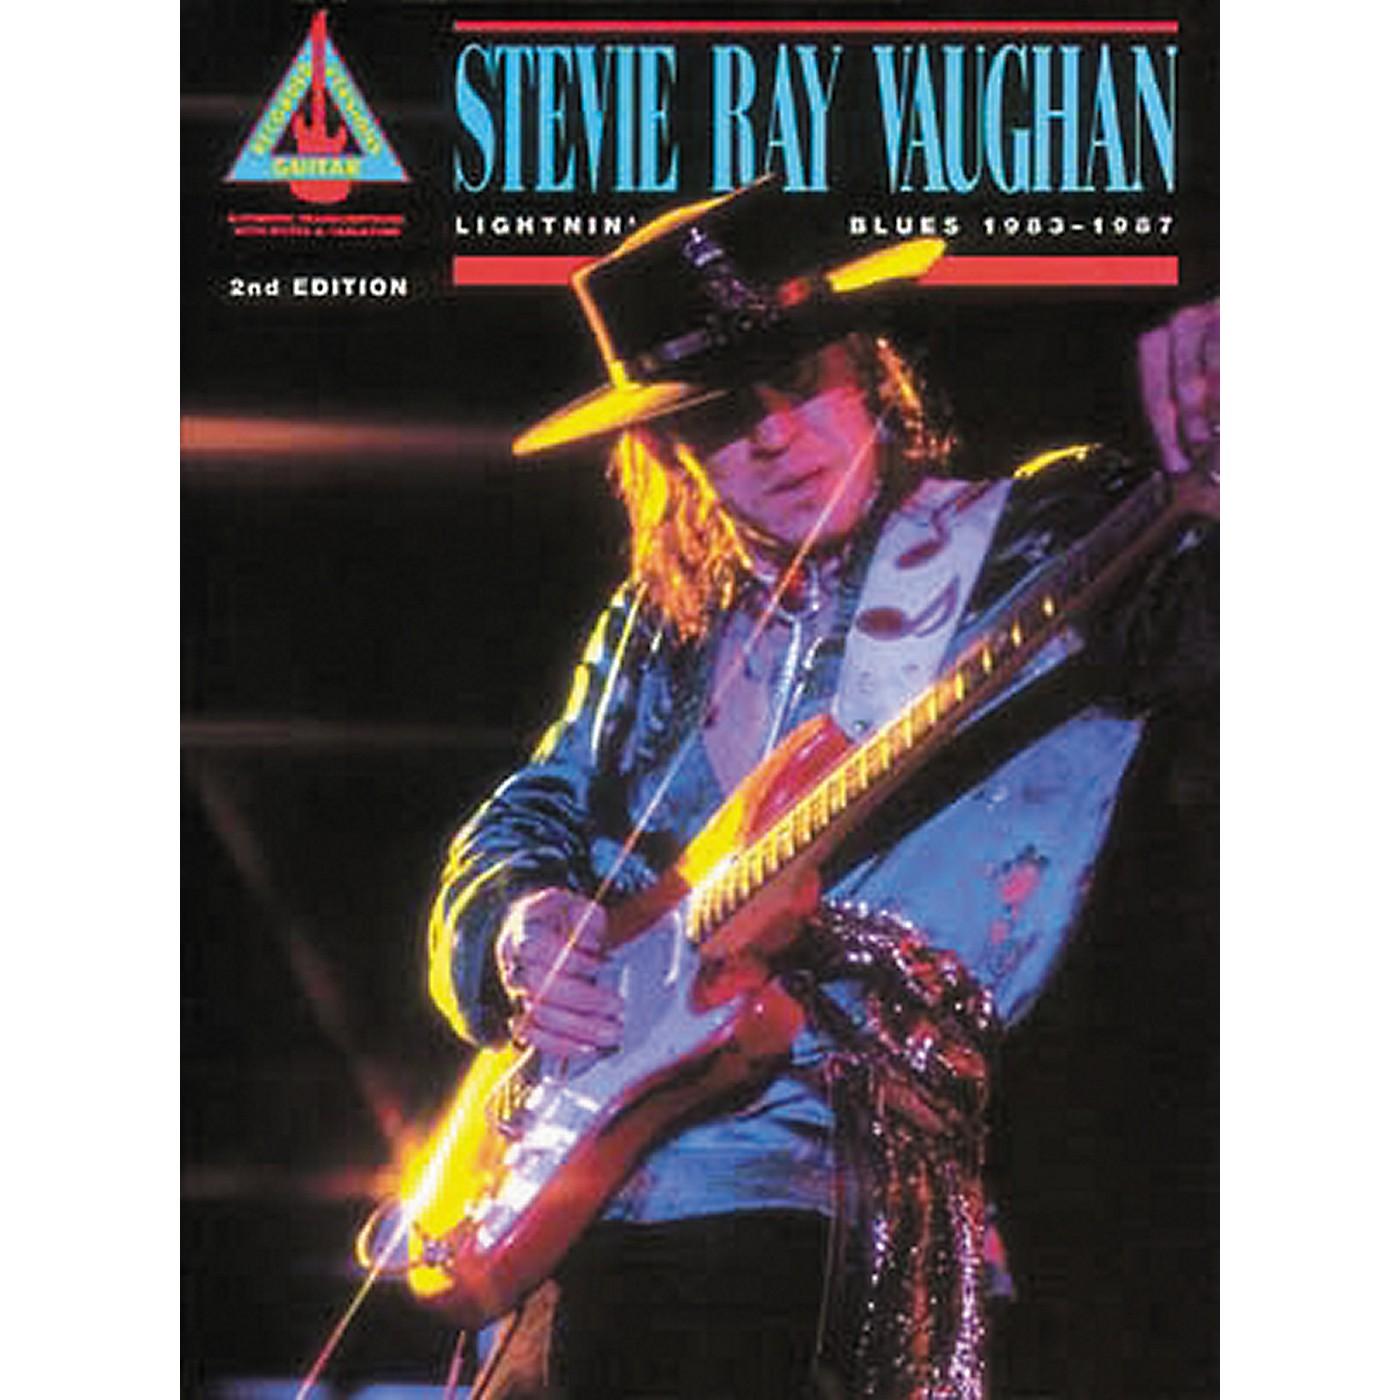 Hal Leonard Stevie Ray Vaughan Lightnin' Blues 1983-1987 Guitar Tab Book thumbnail